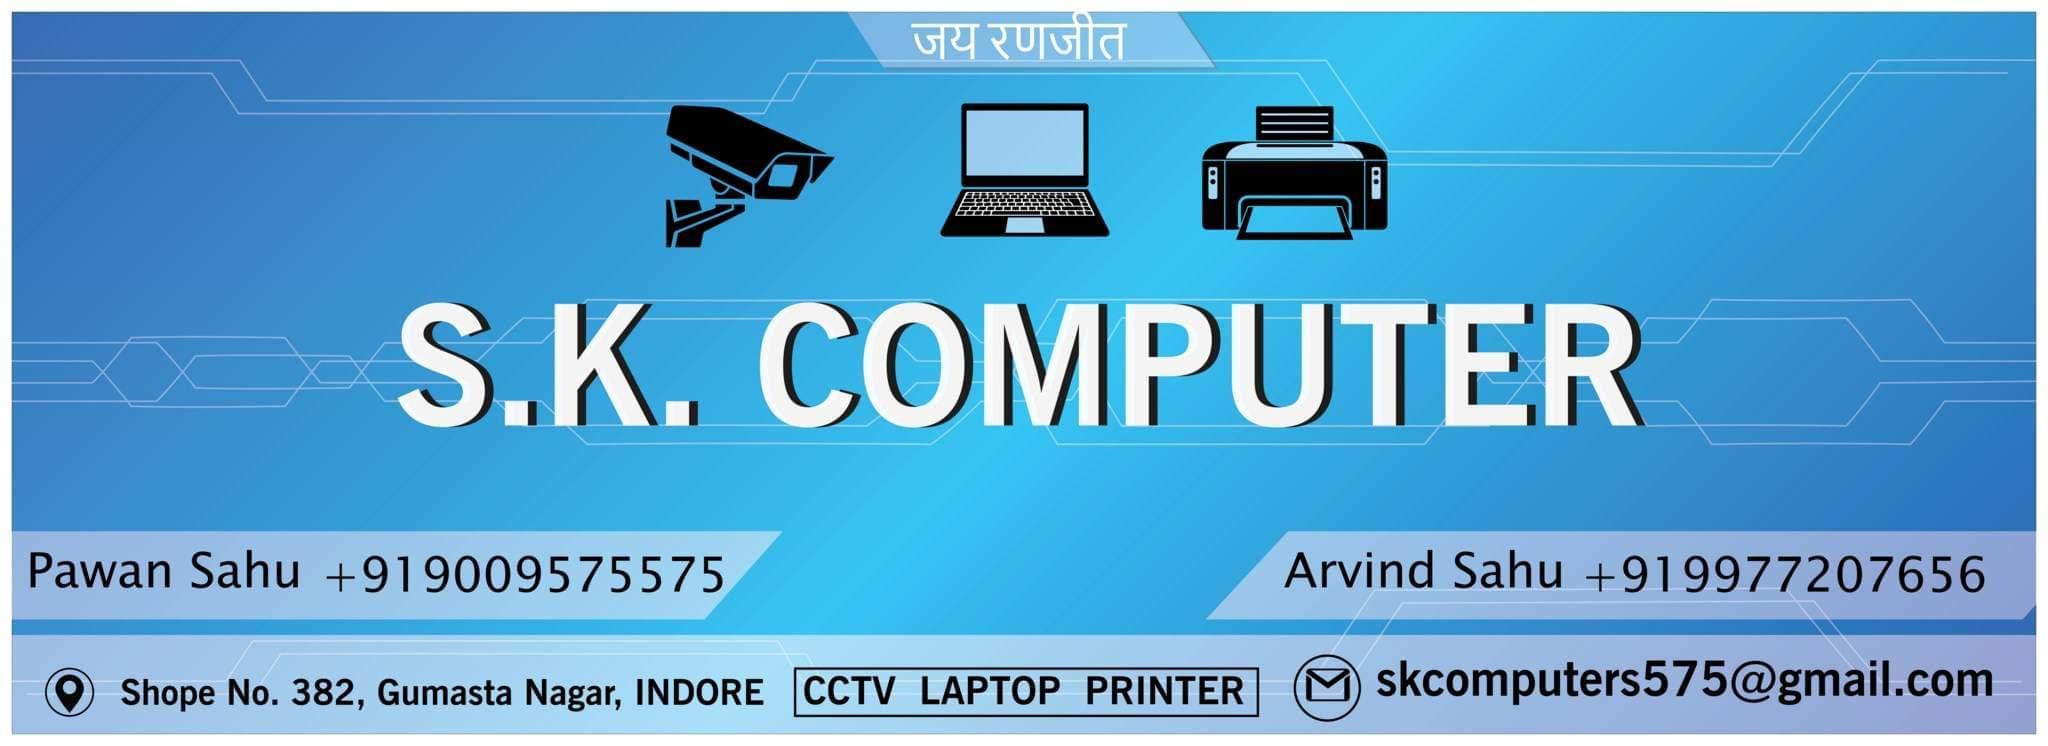 Sk computers